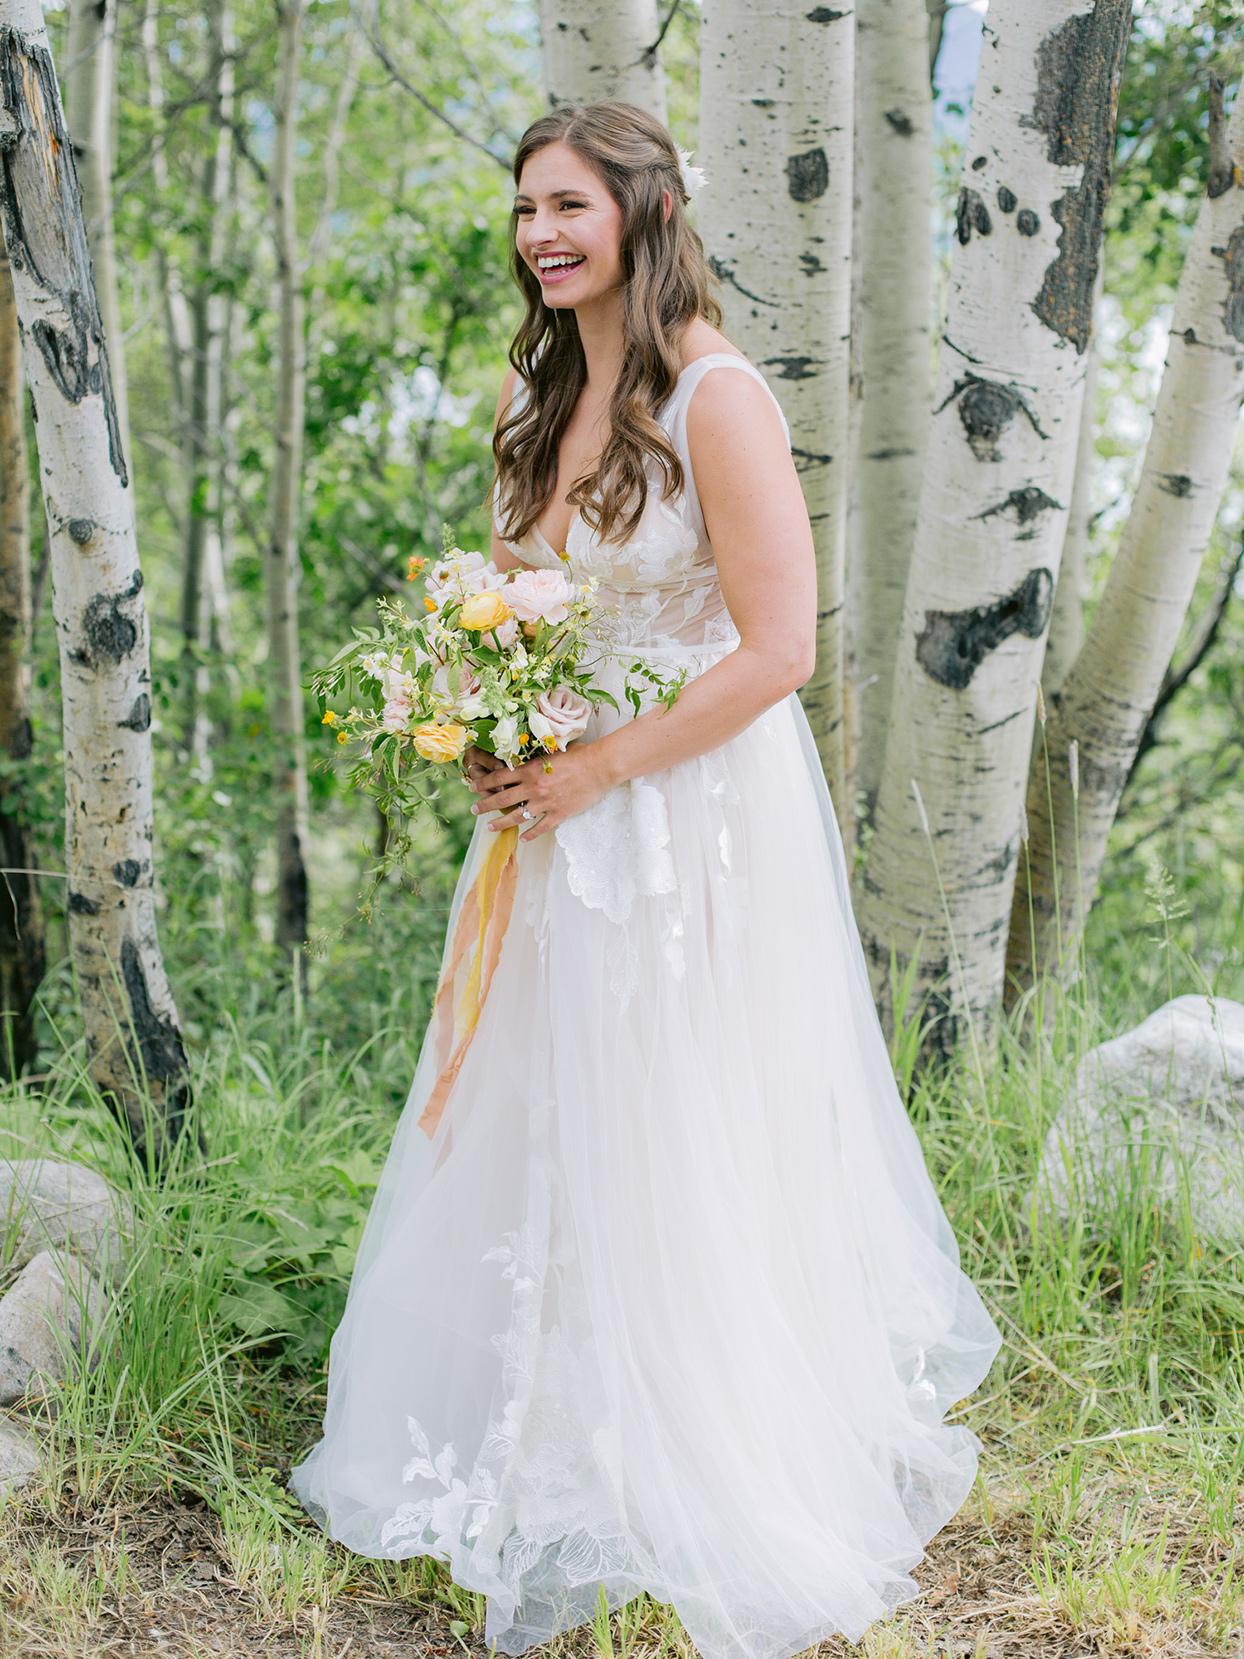 logan conor wedding bride among the trees